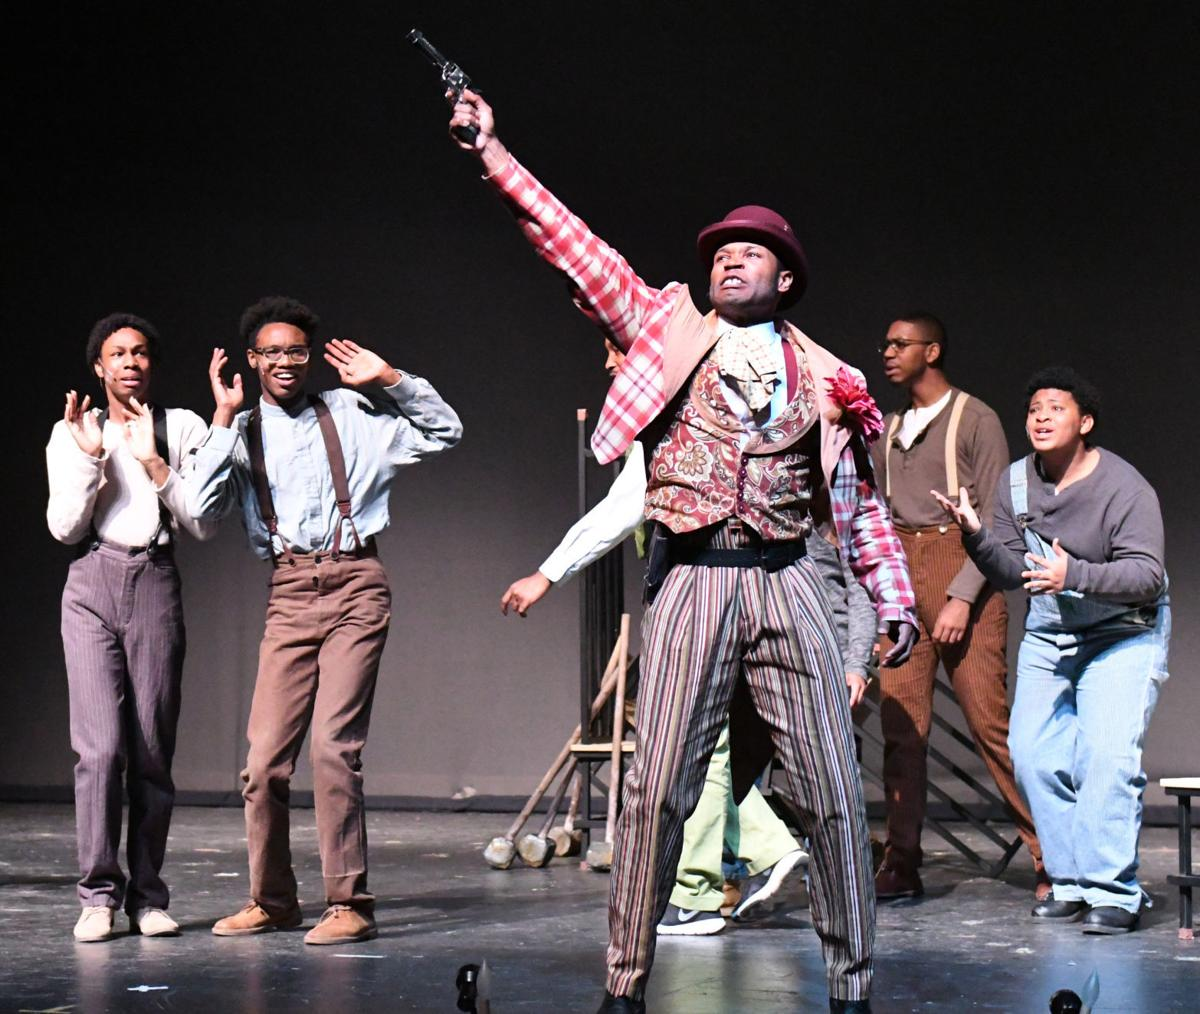 Scottsboro Boys cast on stage with gun